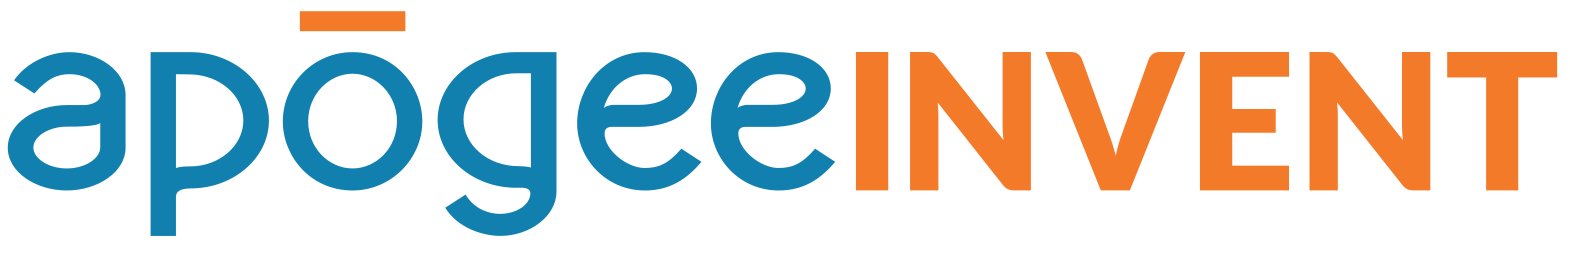 Apogee Digital Marketing newsletter logo